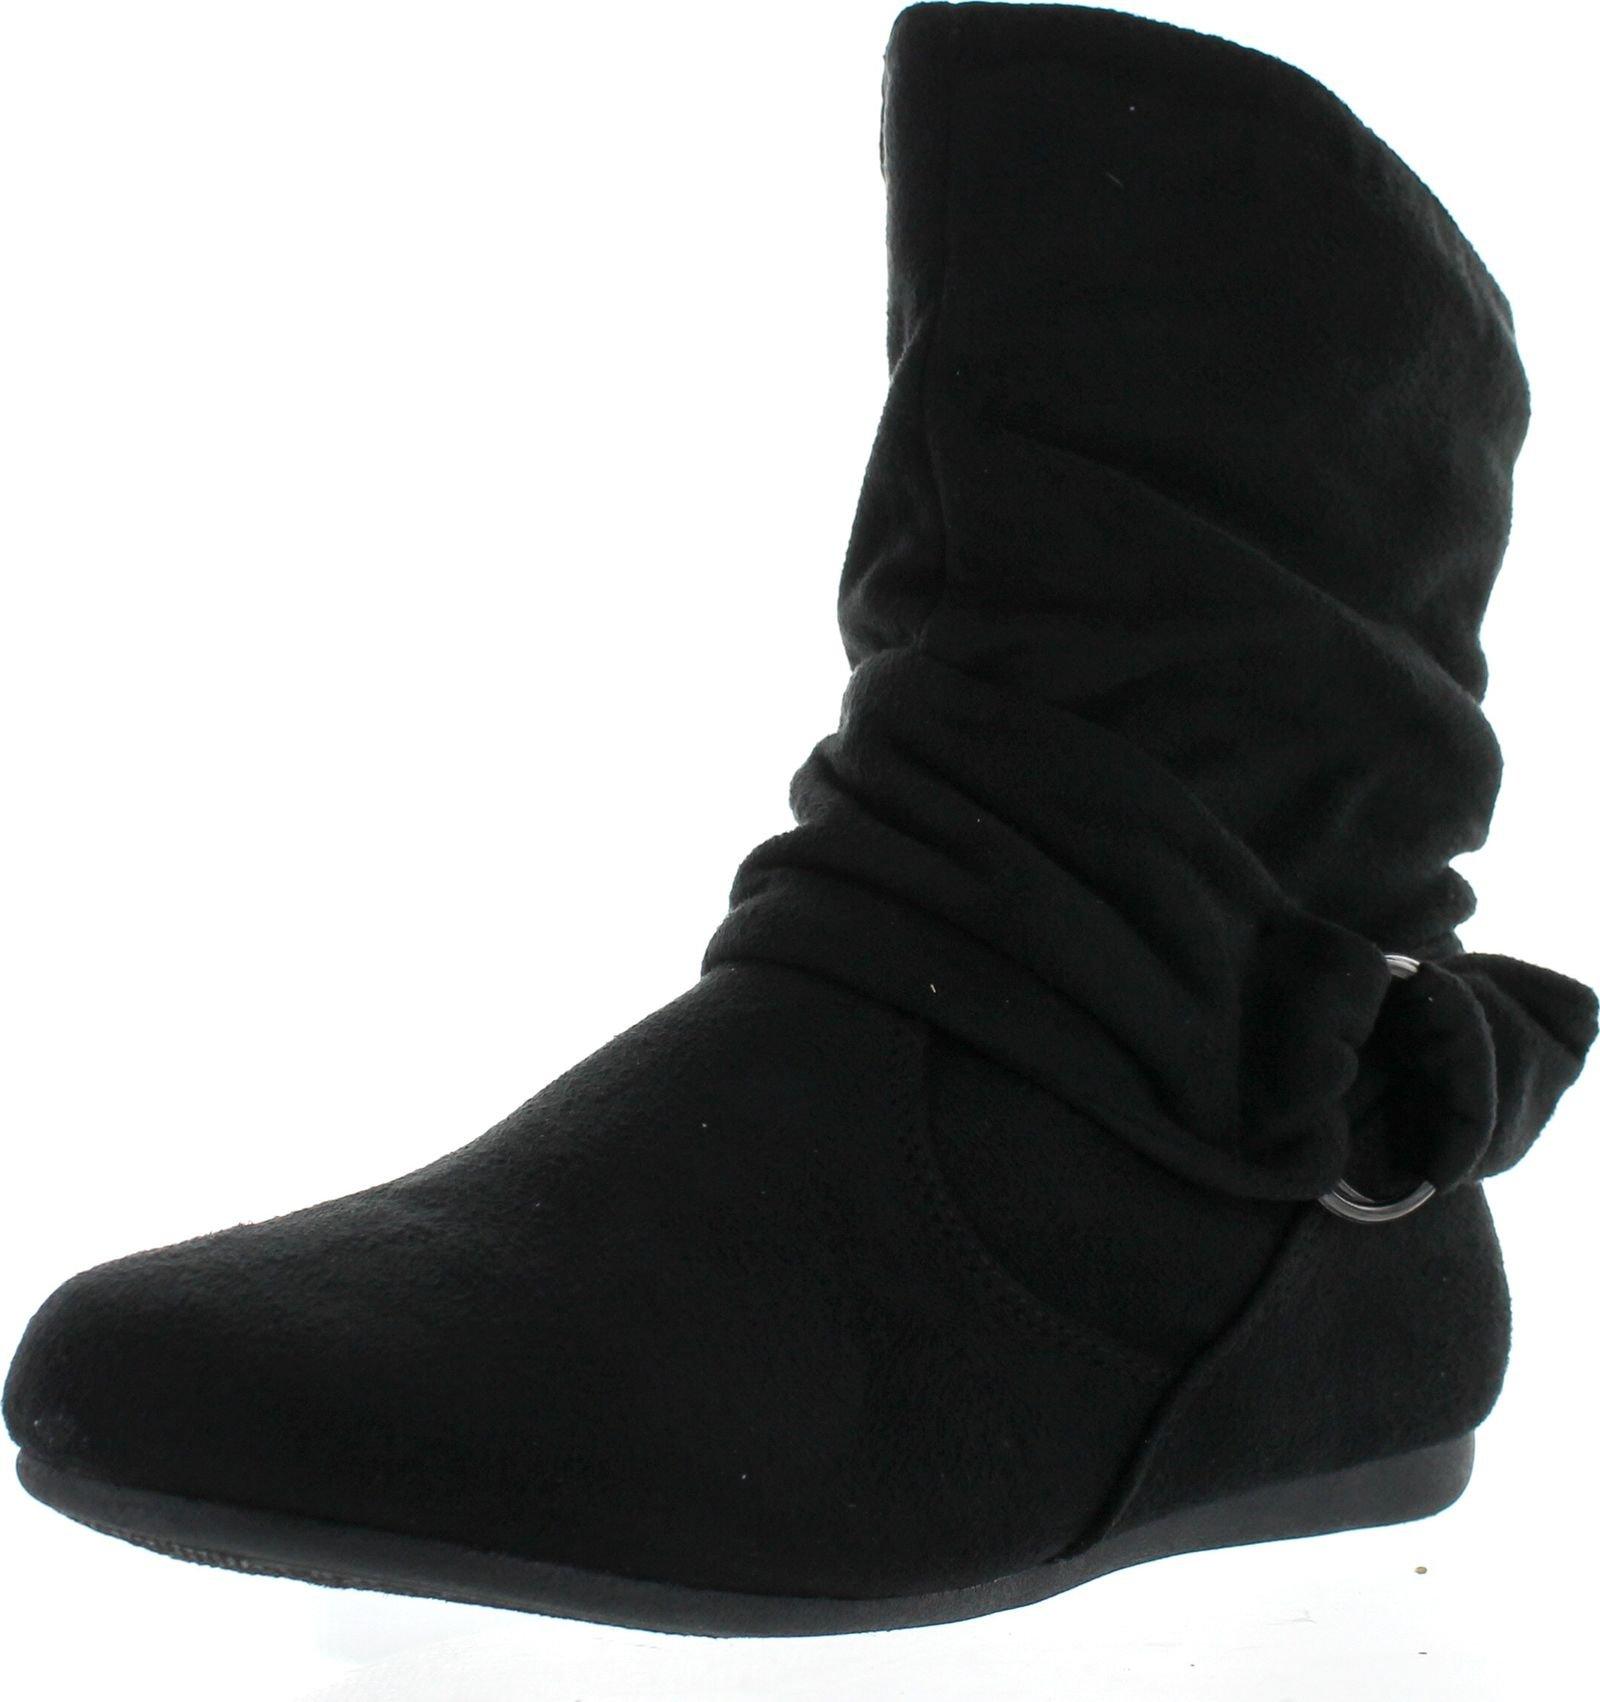 Forever Selena-58 Women's Fashion Mid Calf Flat Heel Side Zipper Slouch Boots,Black,9 by BESTON